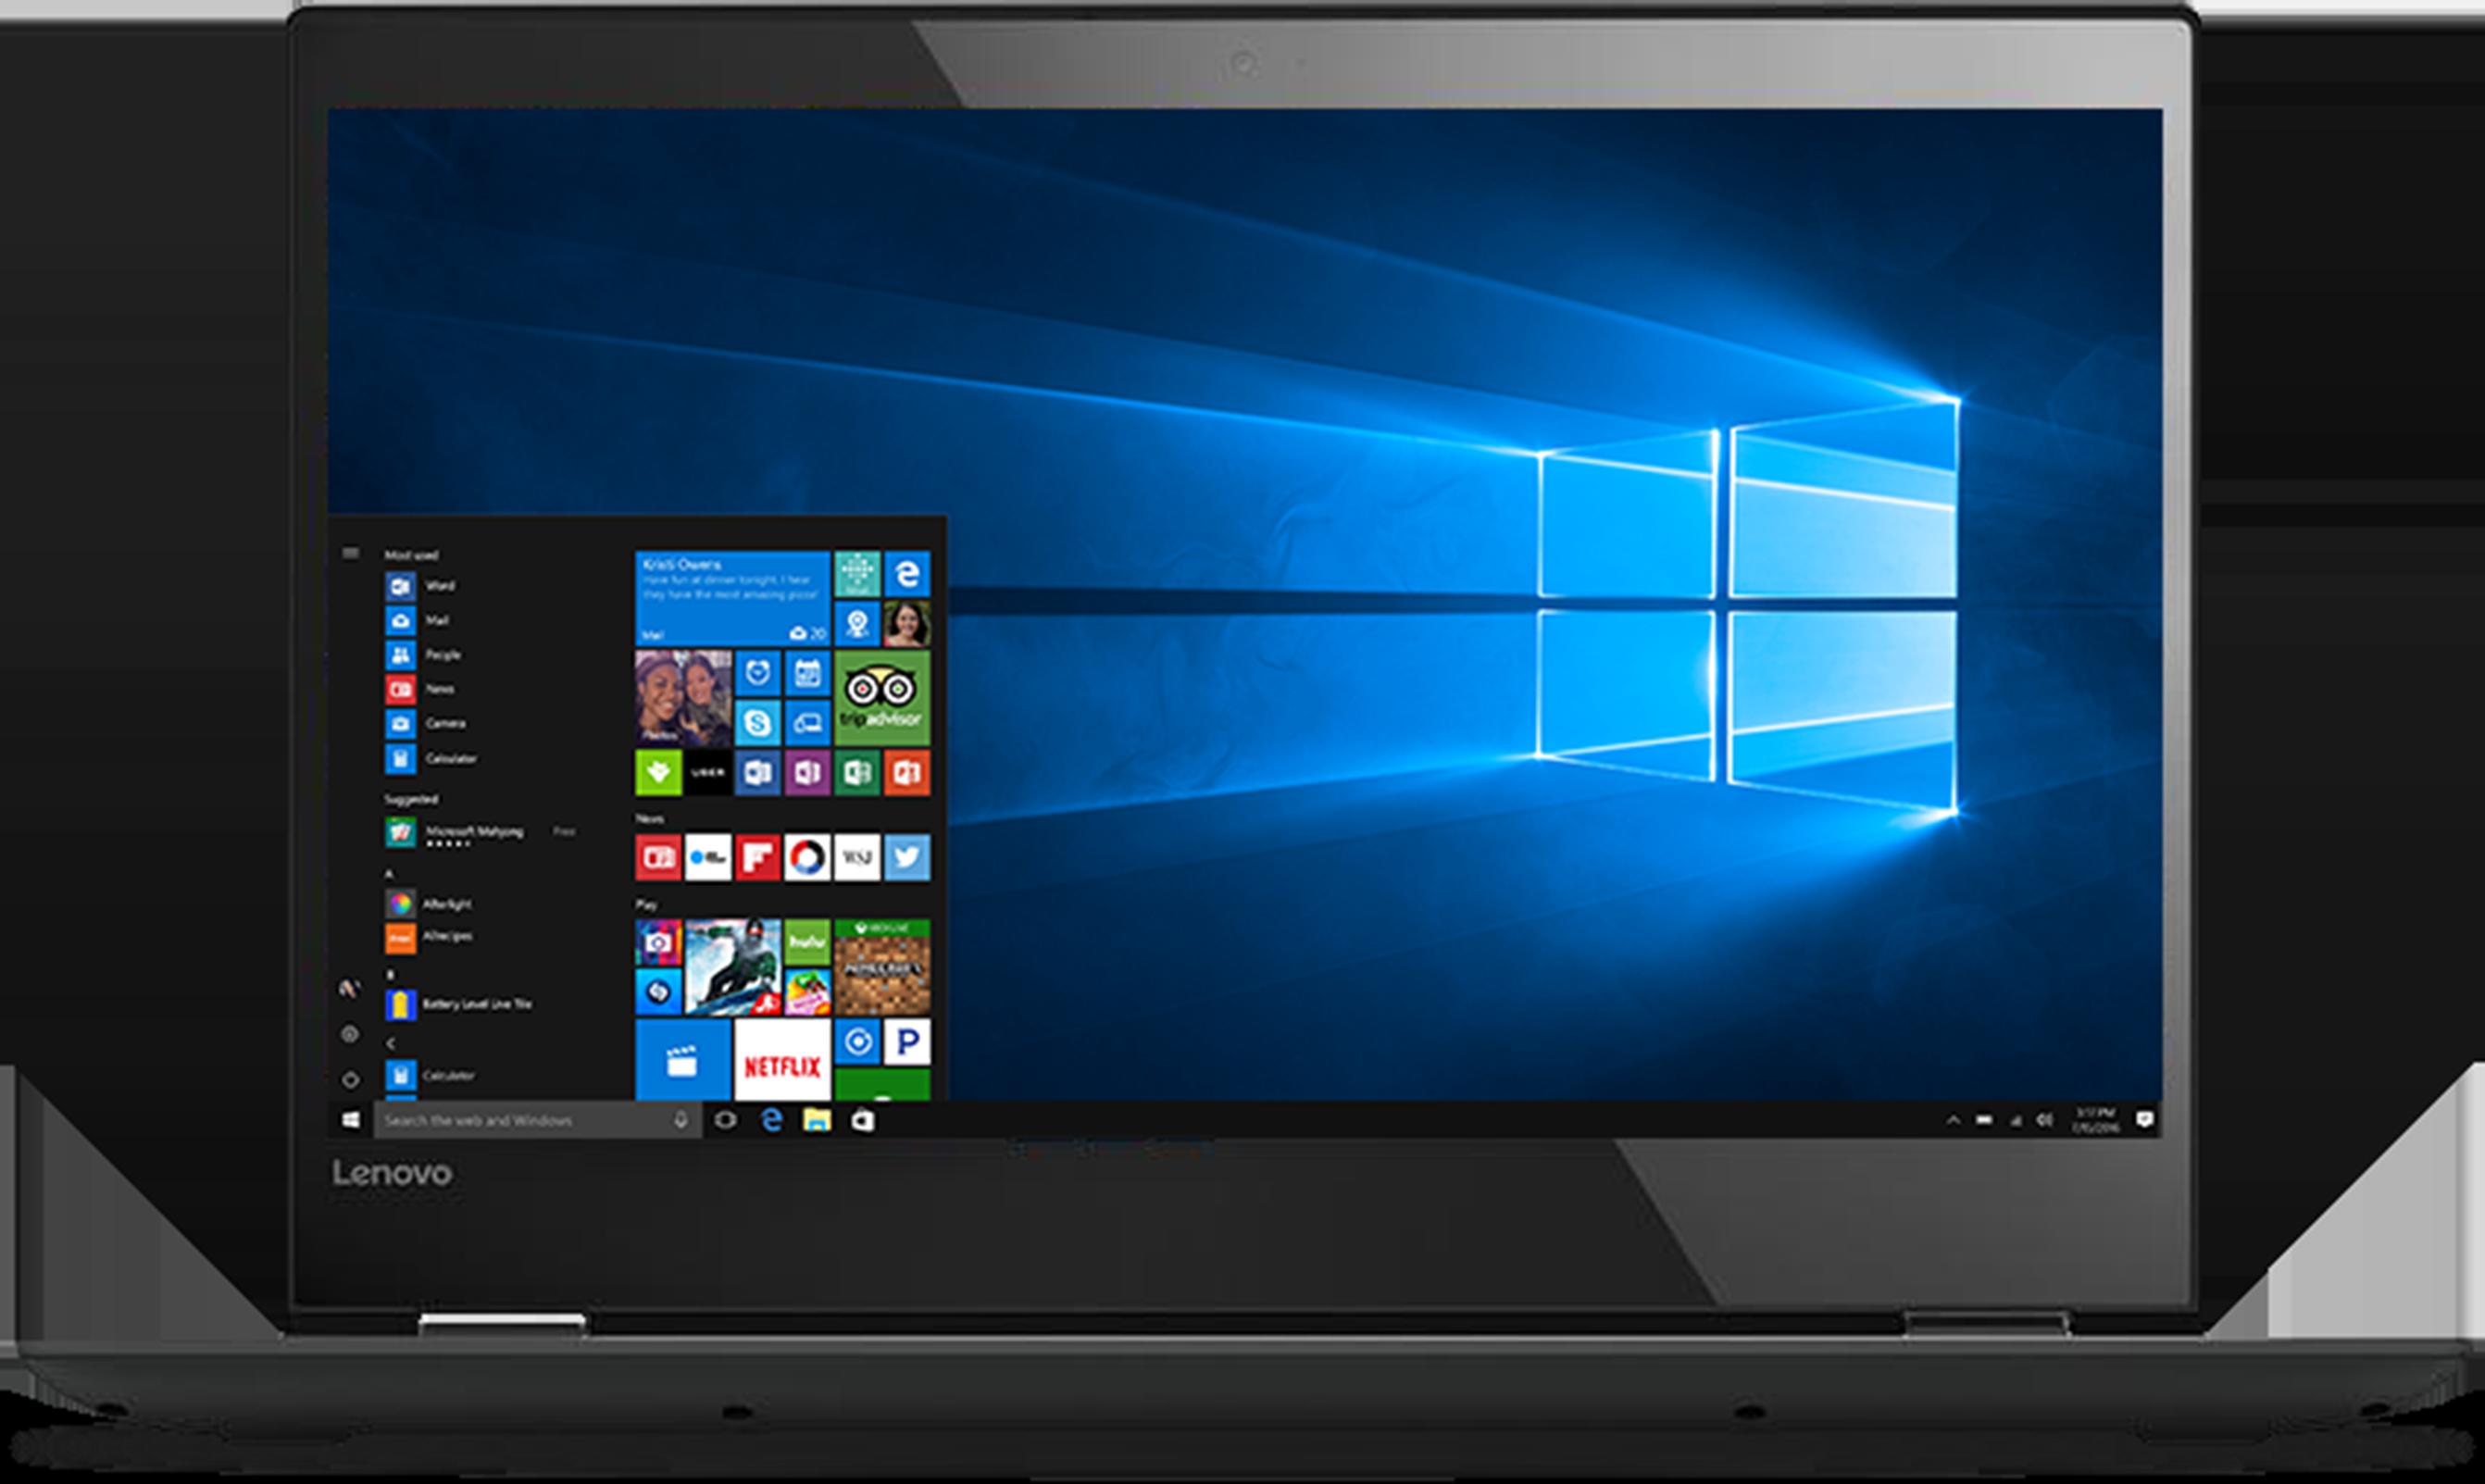 Lenovo Ideapad Flex 5 14 80XA000UUS 2 in 1 PC• 14-inch Full HD touchscreen • Intel i7 7th Gen • 8GB memory/256GB SSD • NVIDIA GeForce 940MX graphics